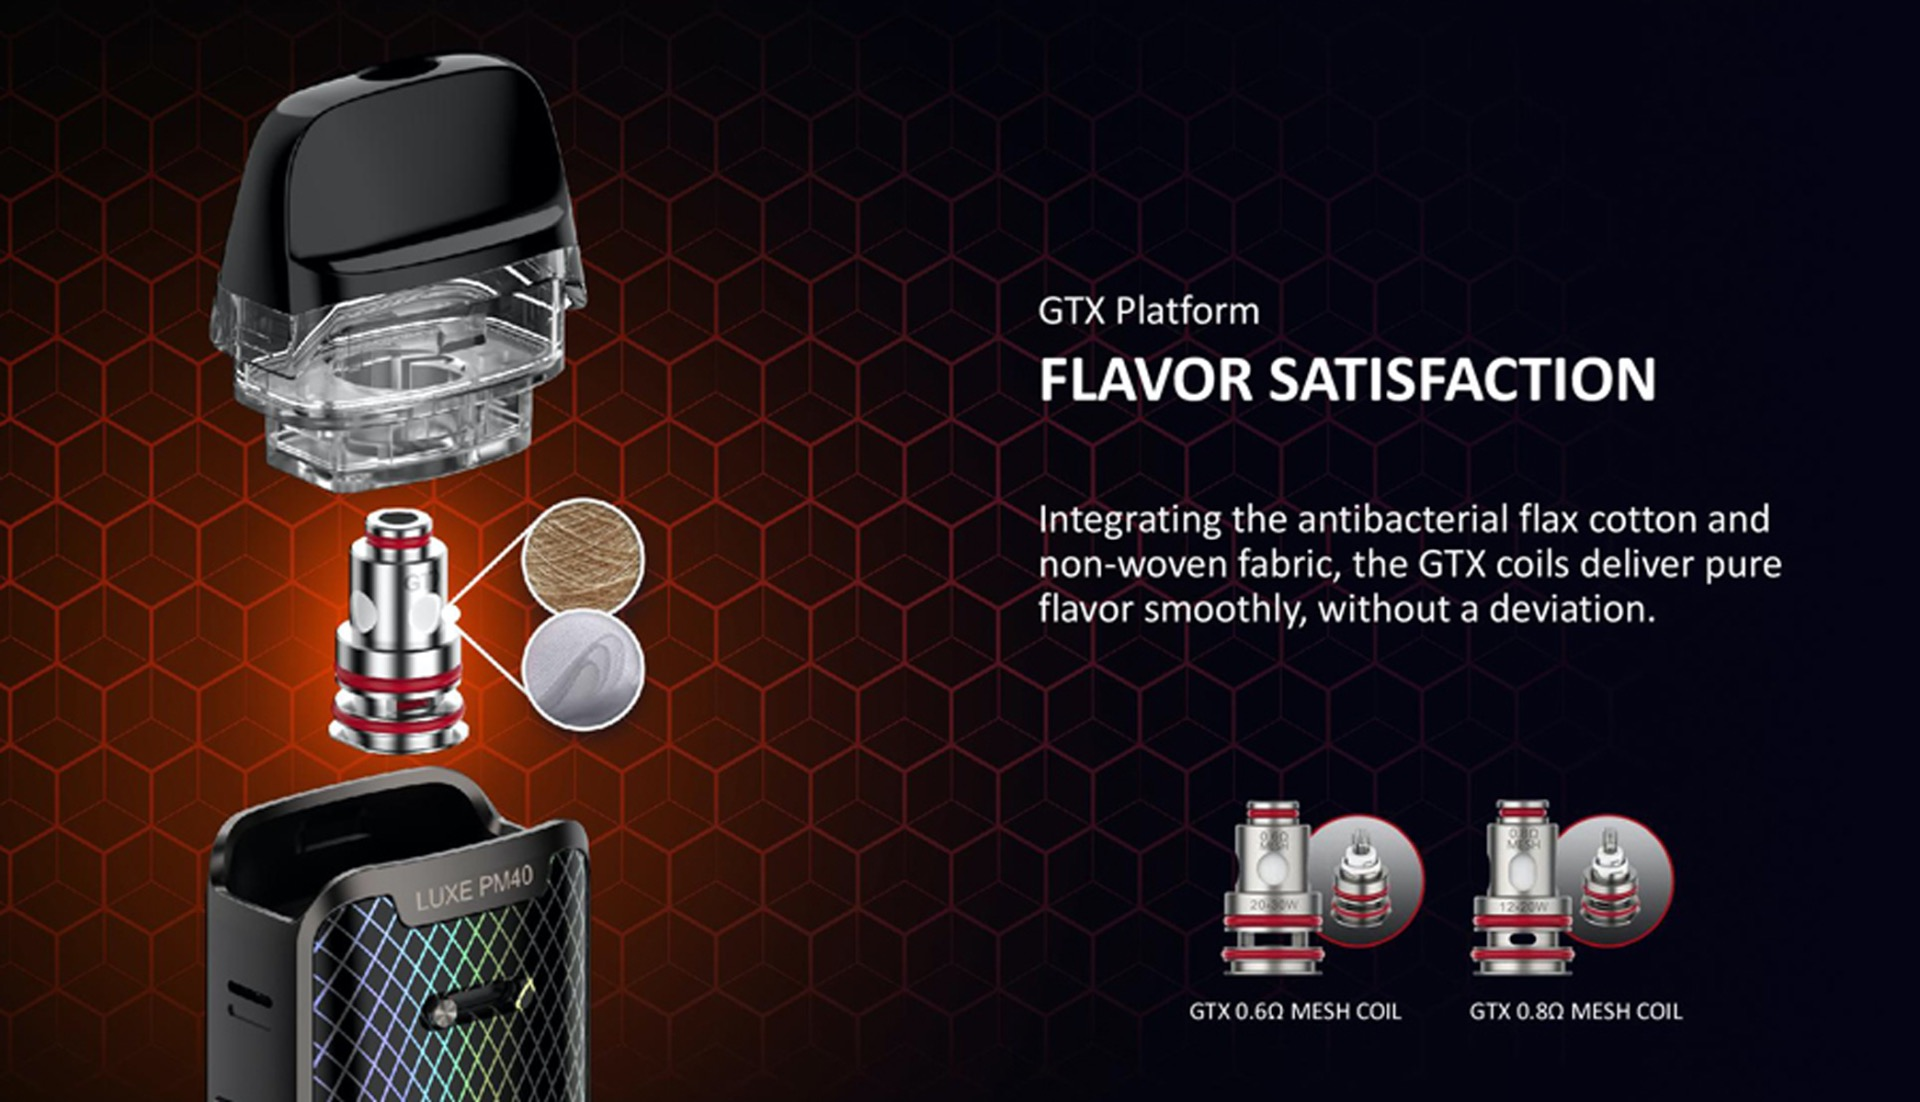 Vaporesso Luxe PM40 flavour satisfaction